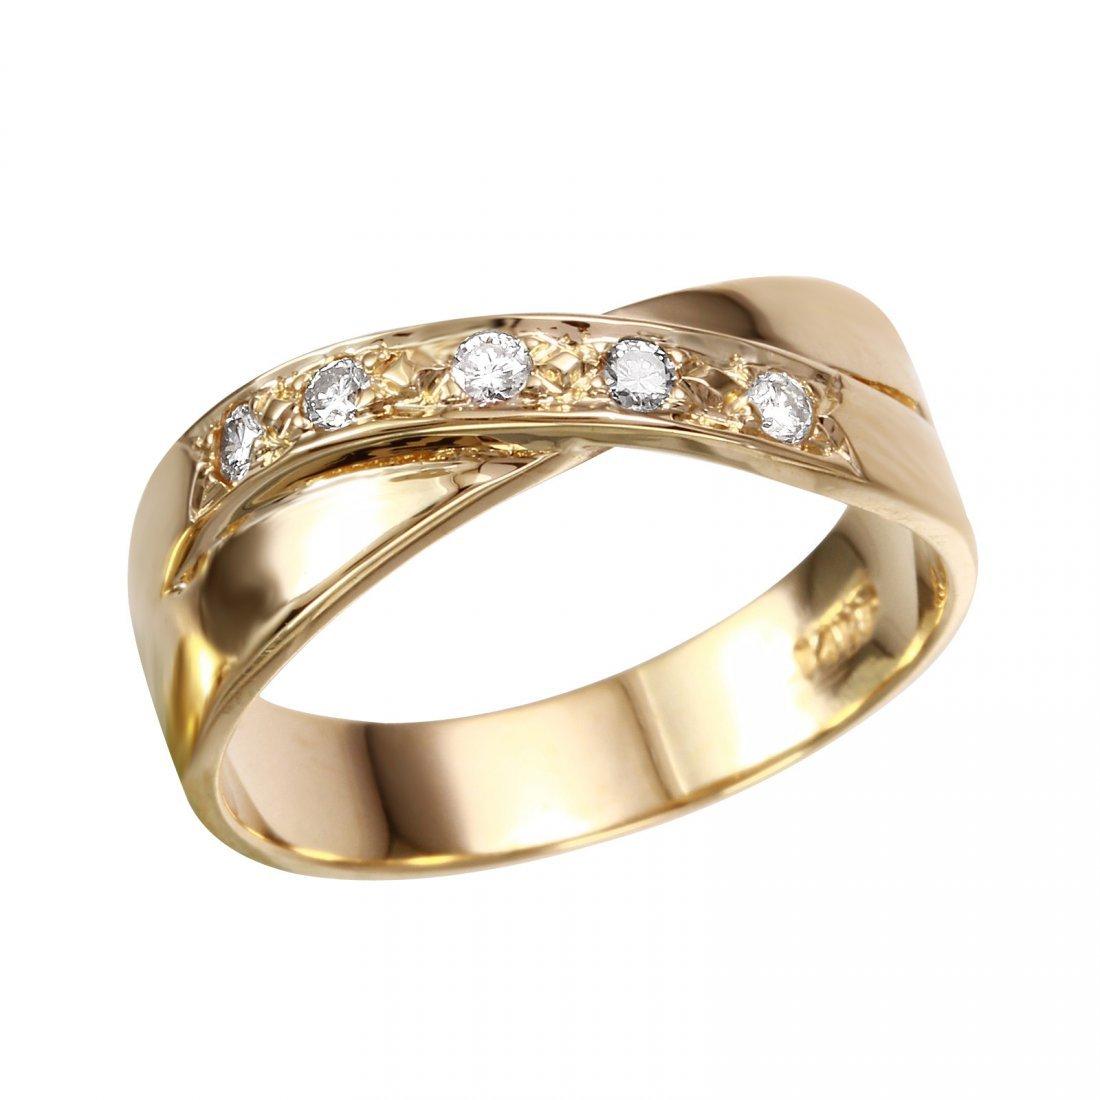 14K Yellow Gold Diamond Crossover Ring, 0.10 ctw